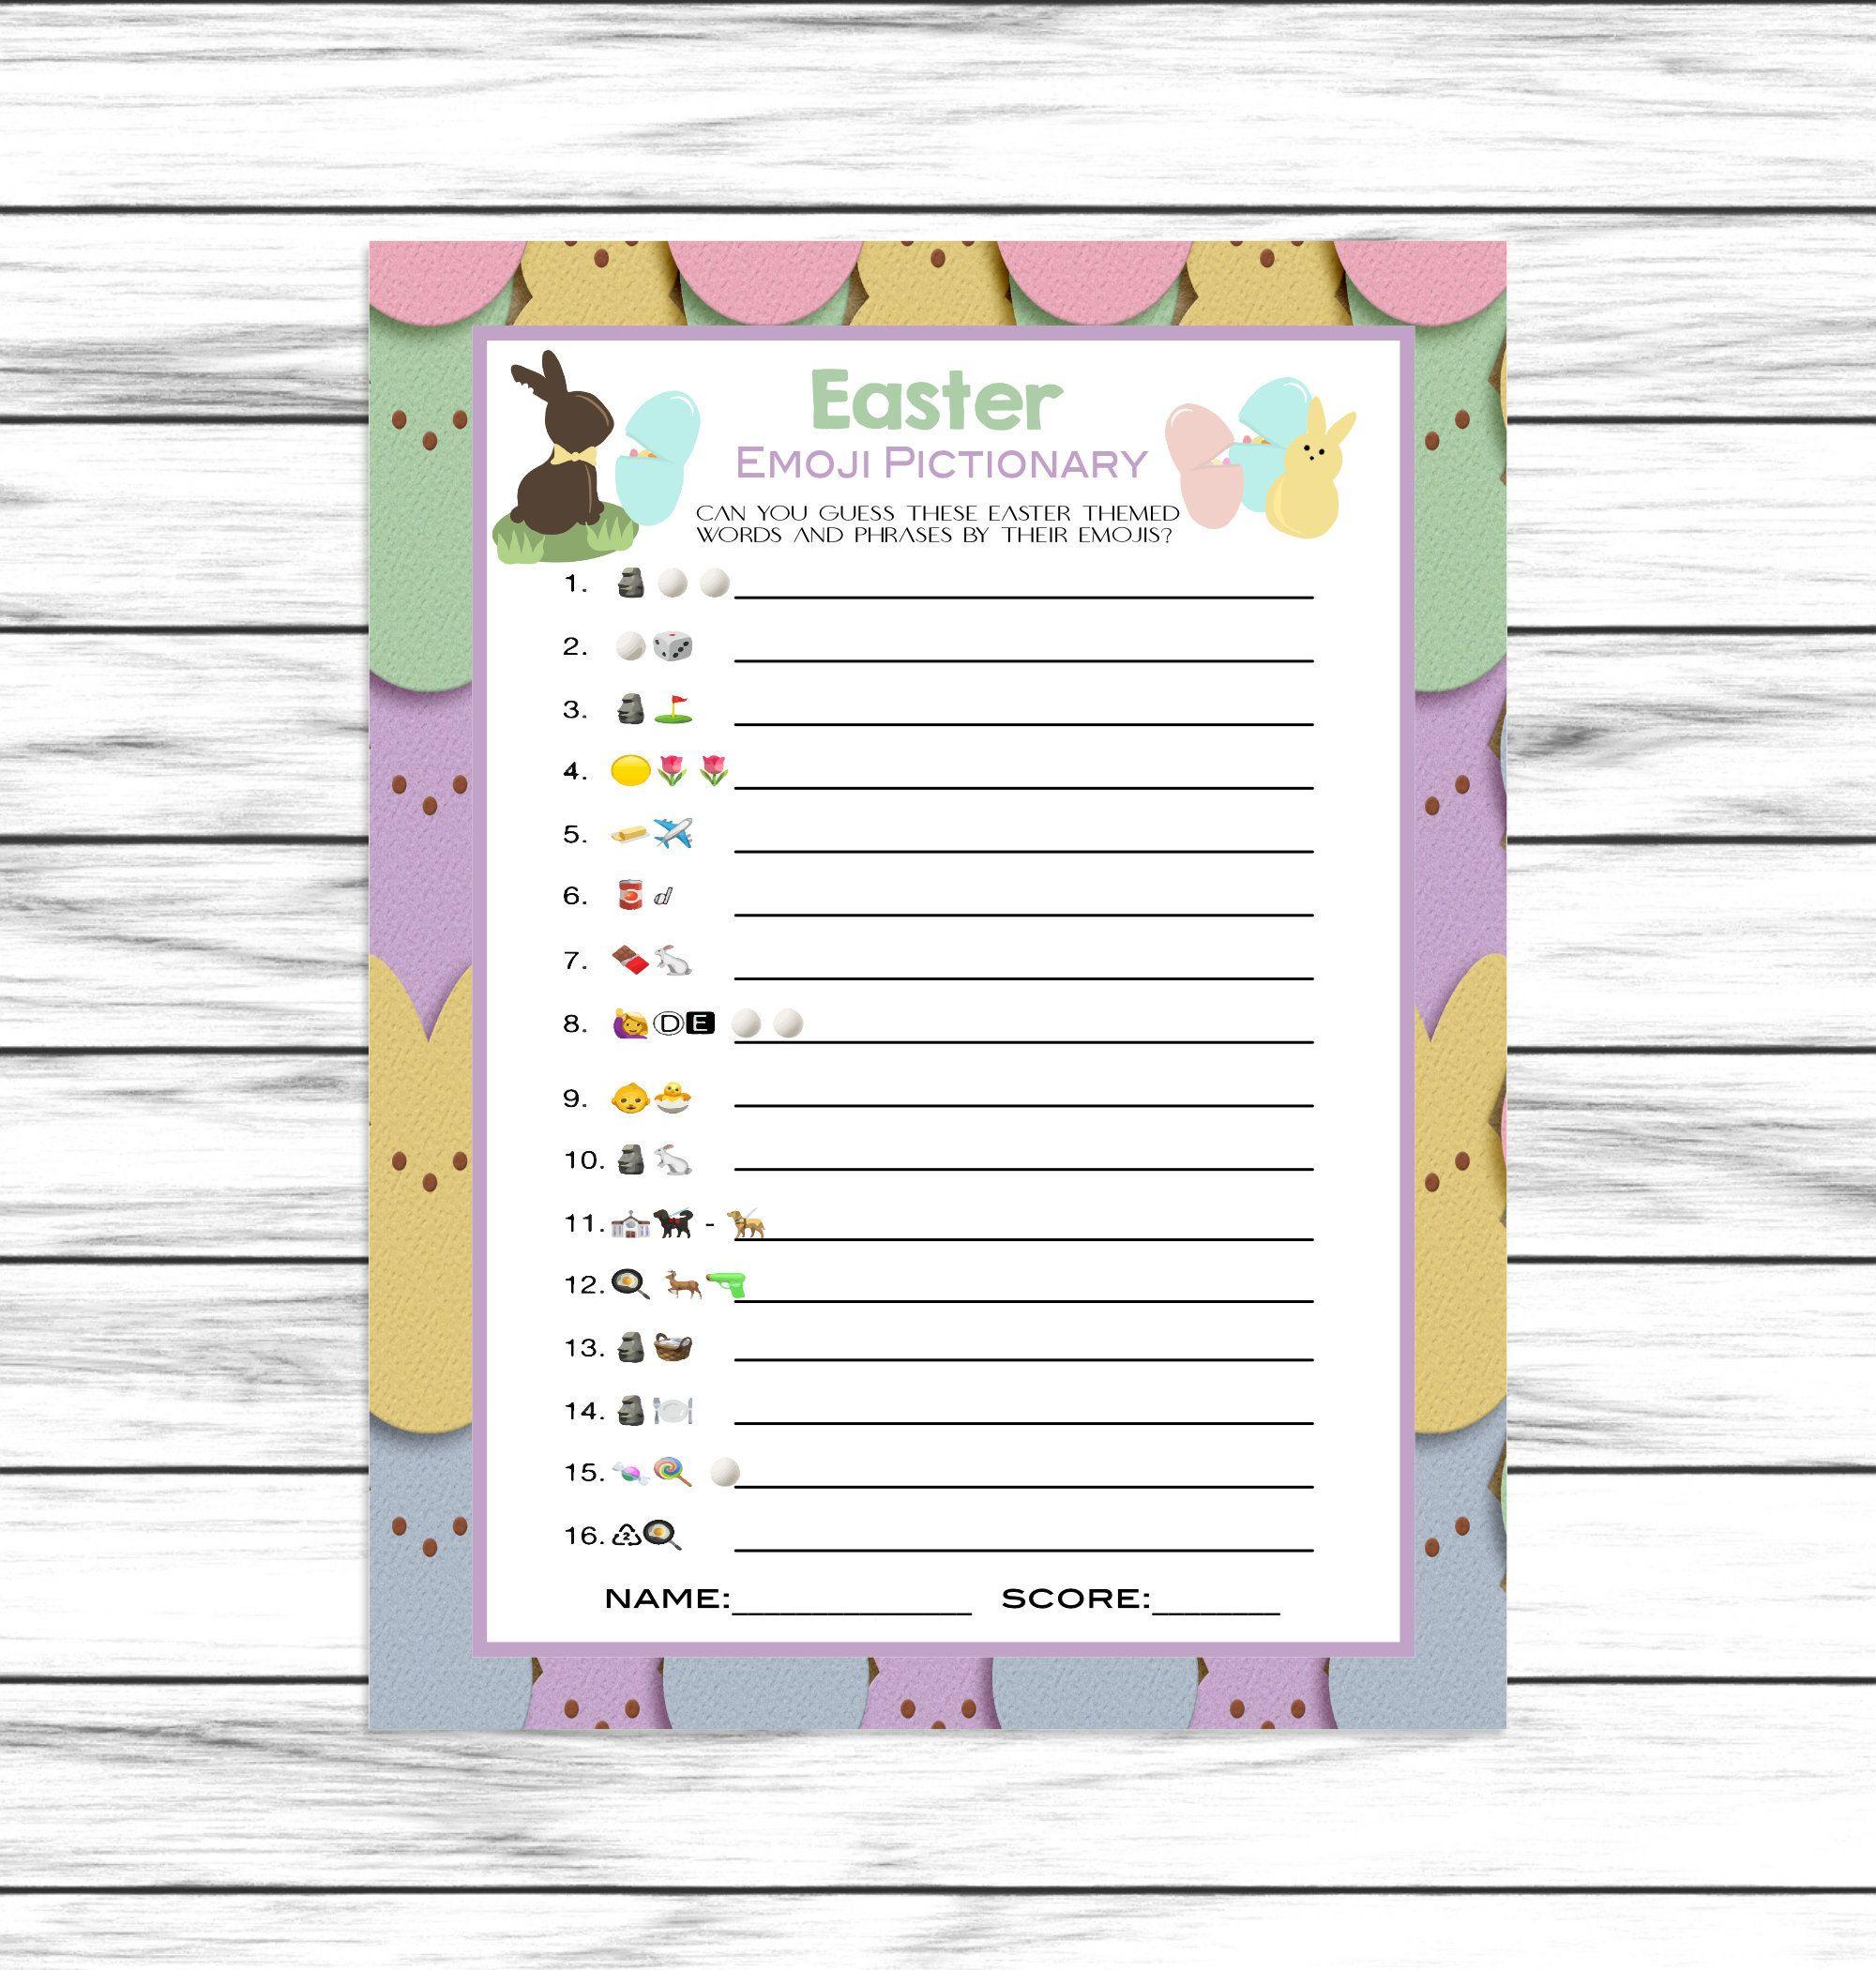 Easter Game Emoji Pictionary Easter Party Game Emoji Game Etsy In 2020 Easter Party Games Easter Games Easter Emoji